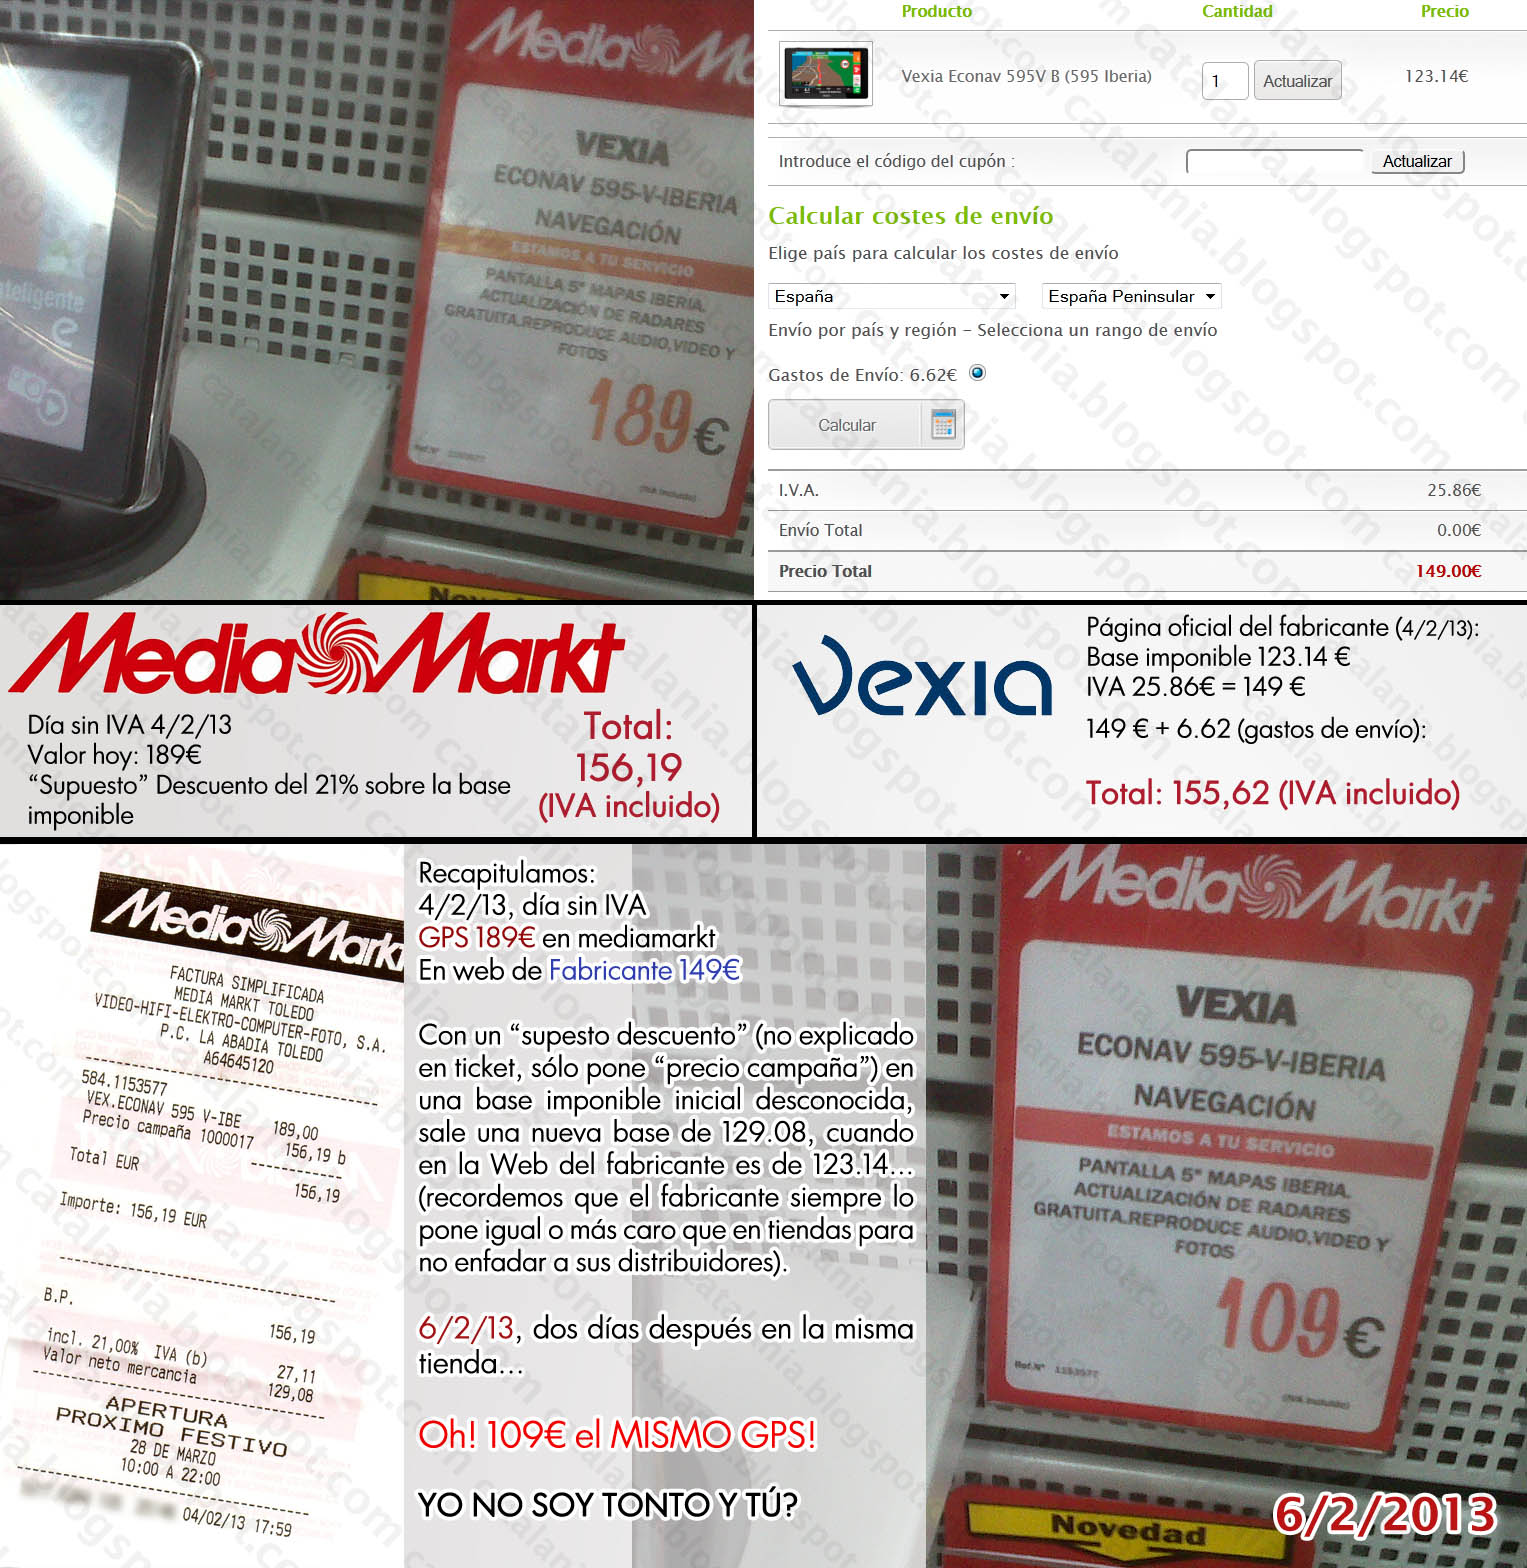 Catalania mediamarkt la estafa del d a sin iva for Media markt fotos precios